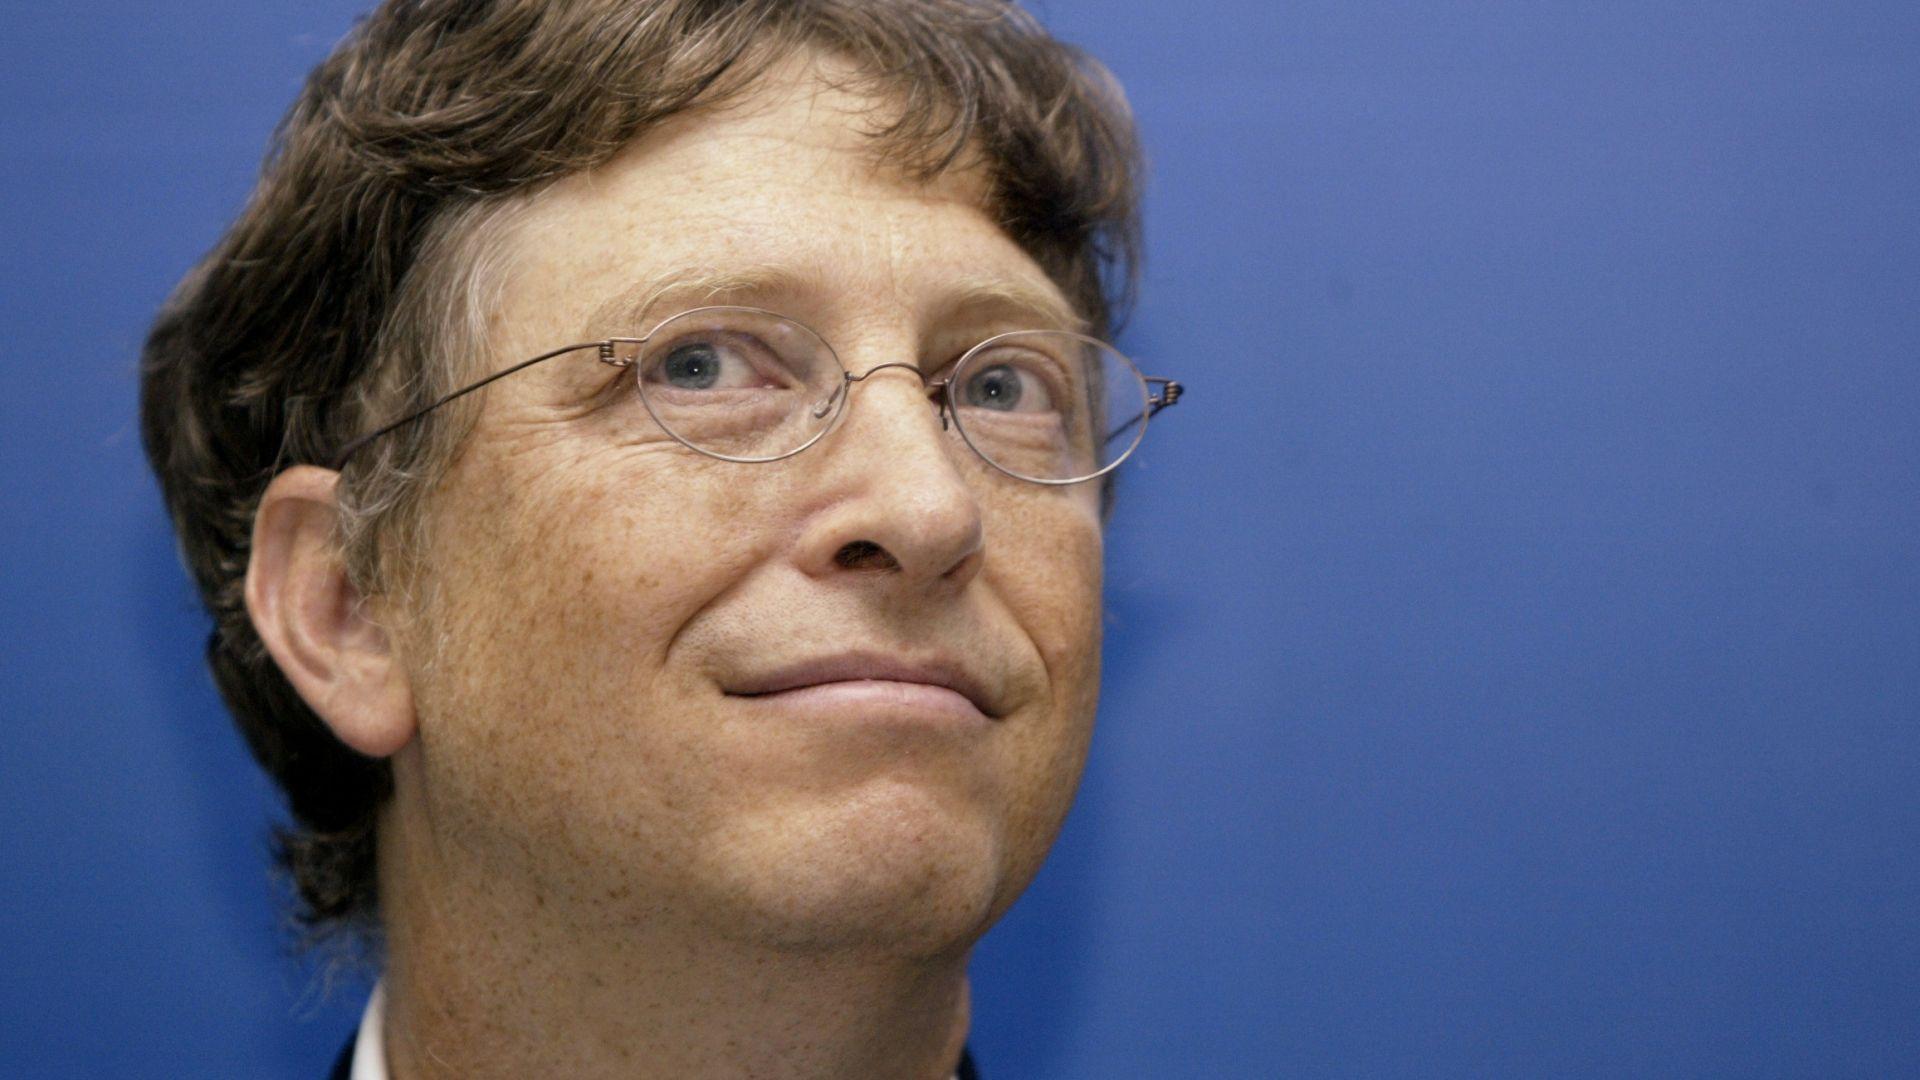 Основателят на Майкрософт (Microsoft) Бил Гейтс стана електронен гражданин на